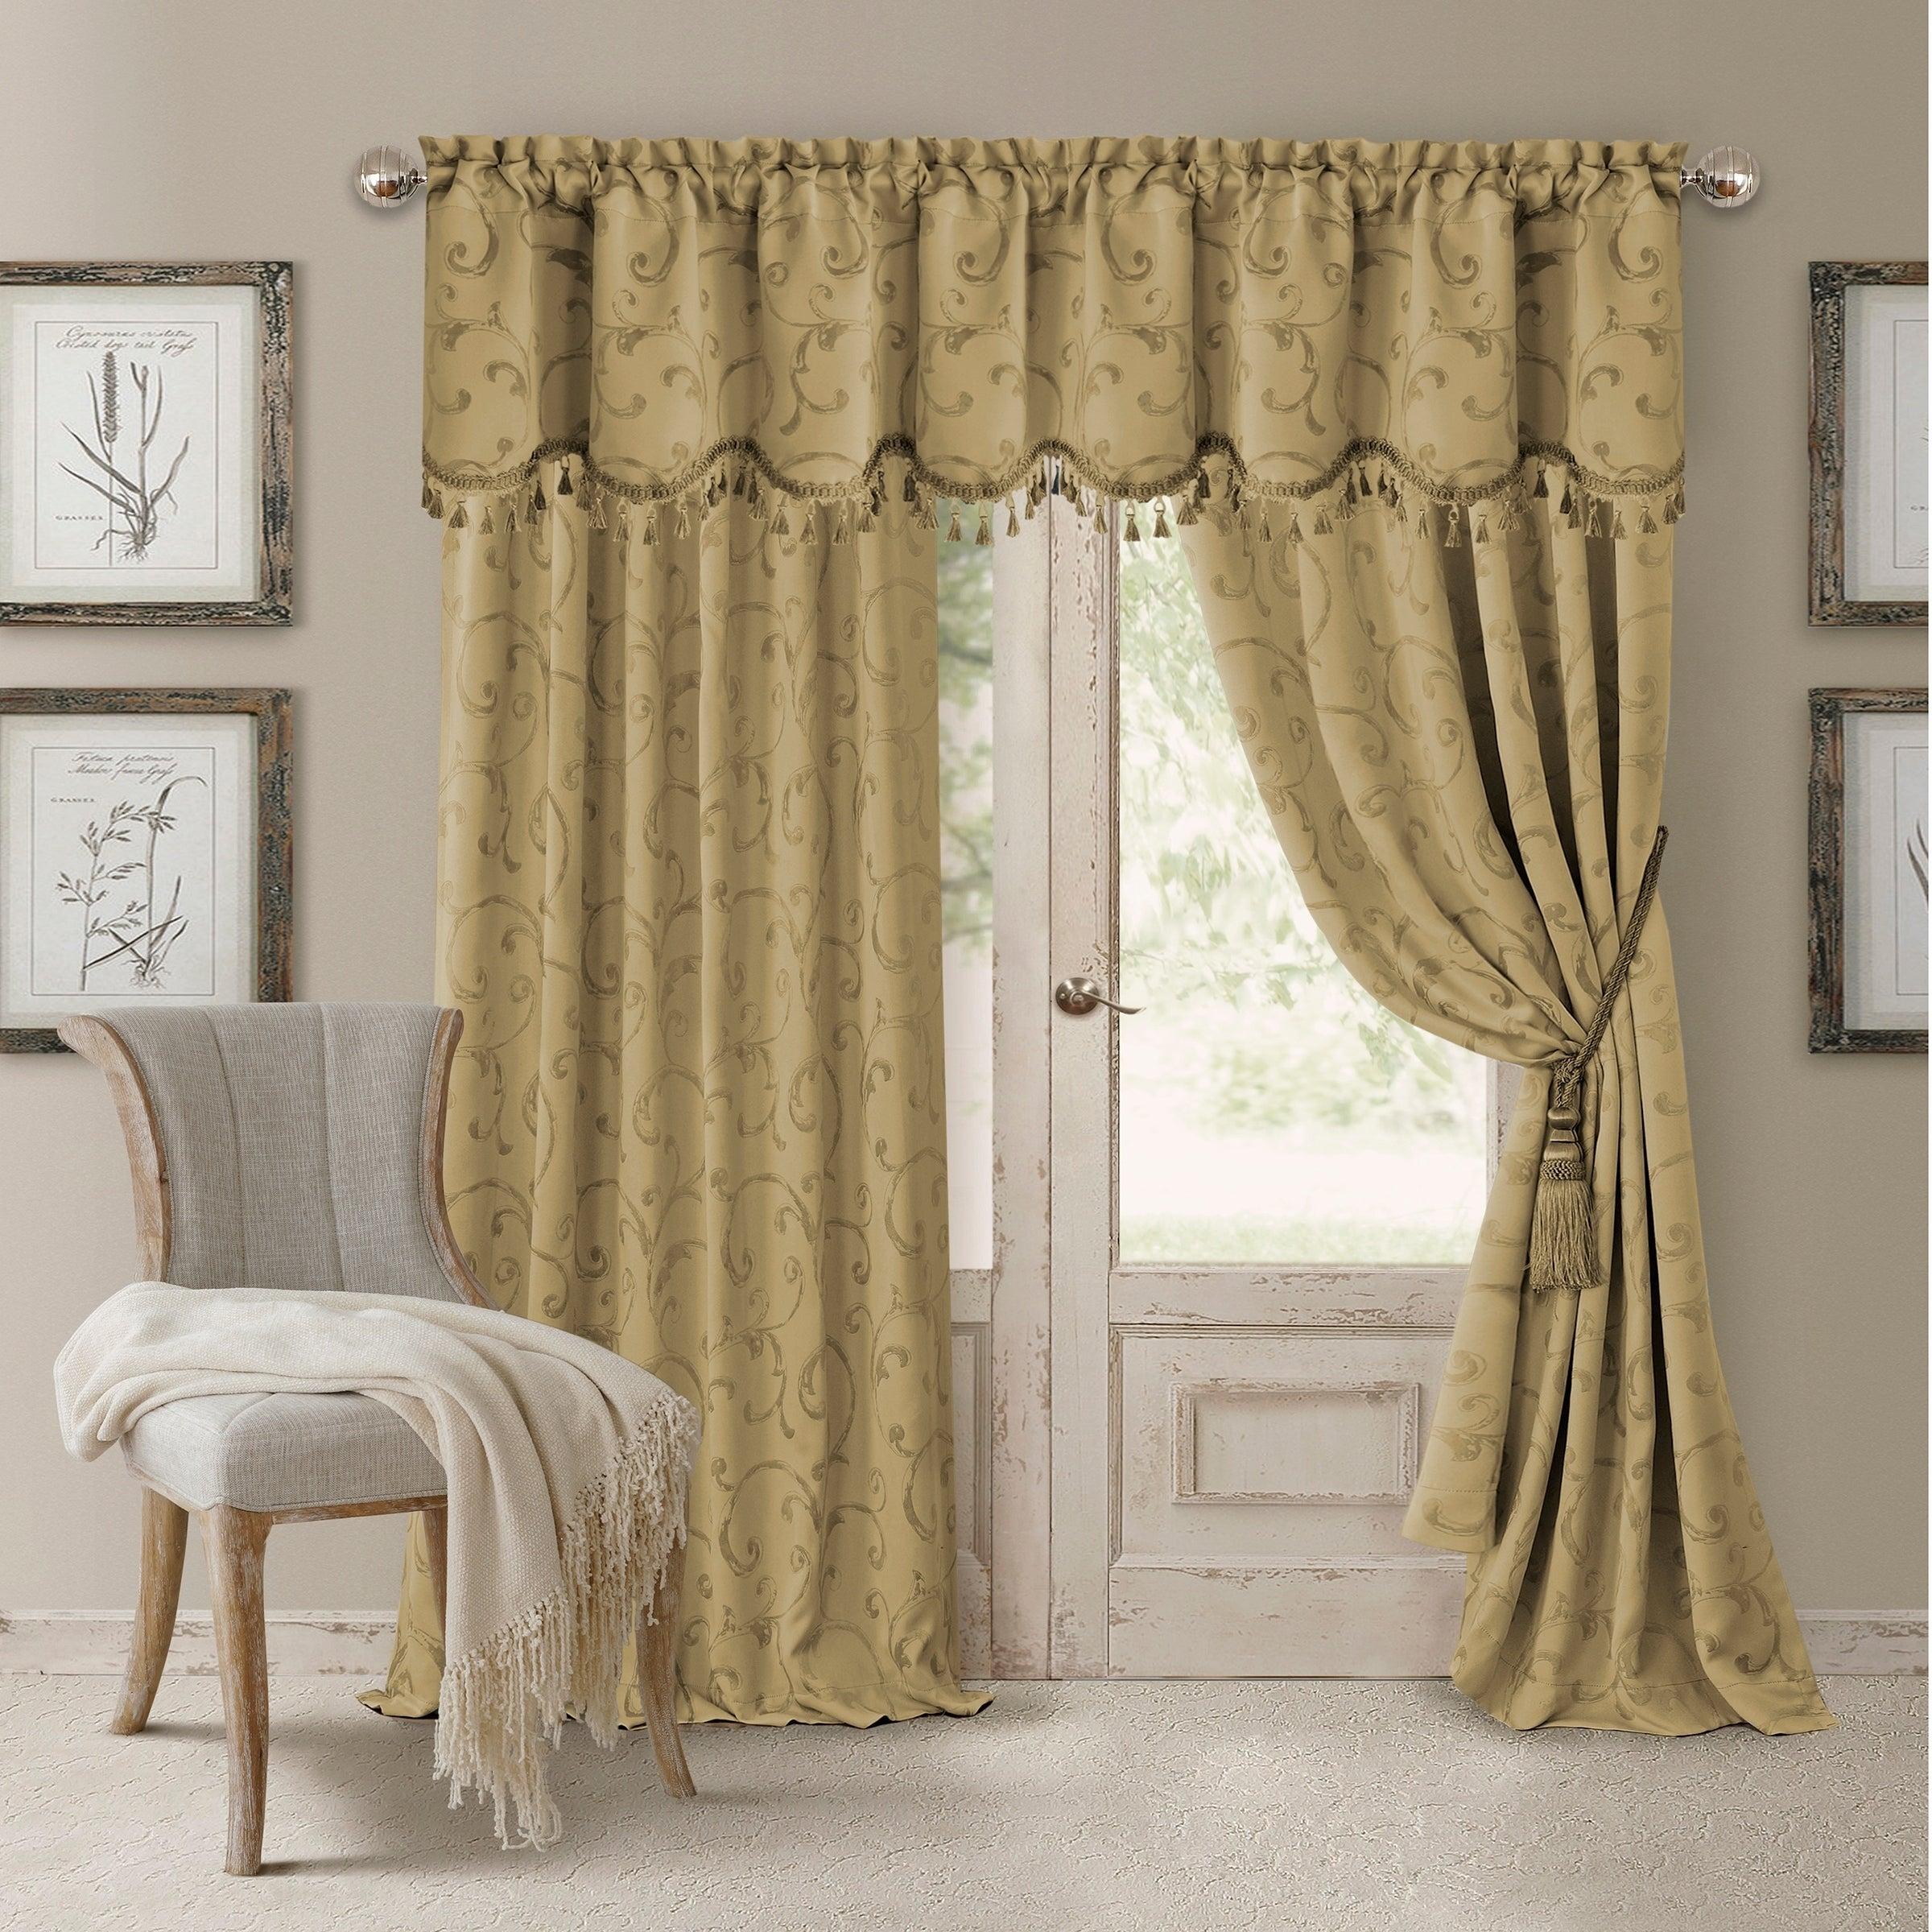 Elrene Mia Jacquard Blackout Curtain Panel Regarding Elrene Mia Jacquard Blackout Curtain Panels (View 3 of 20)